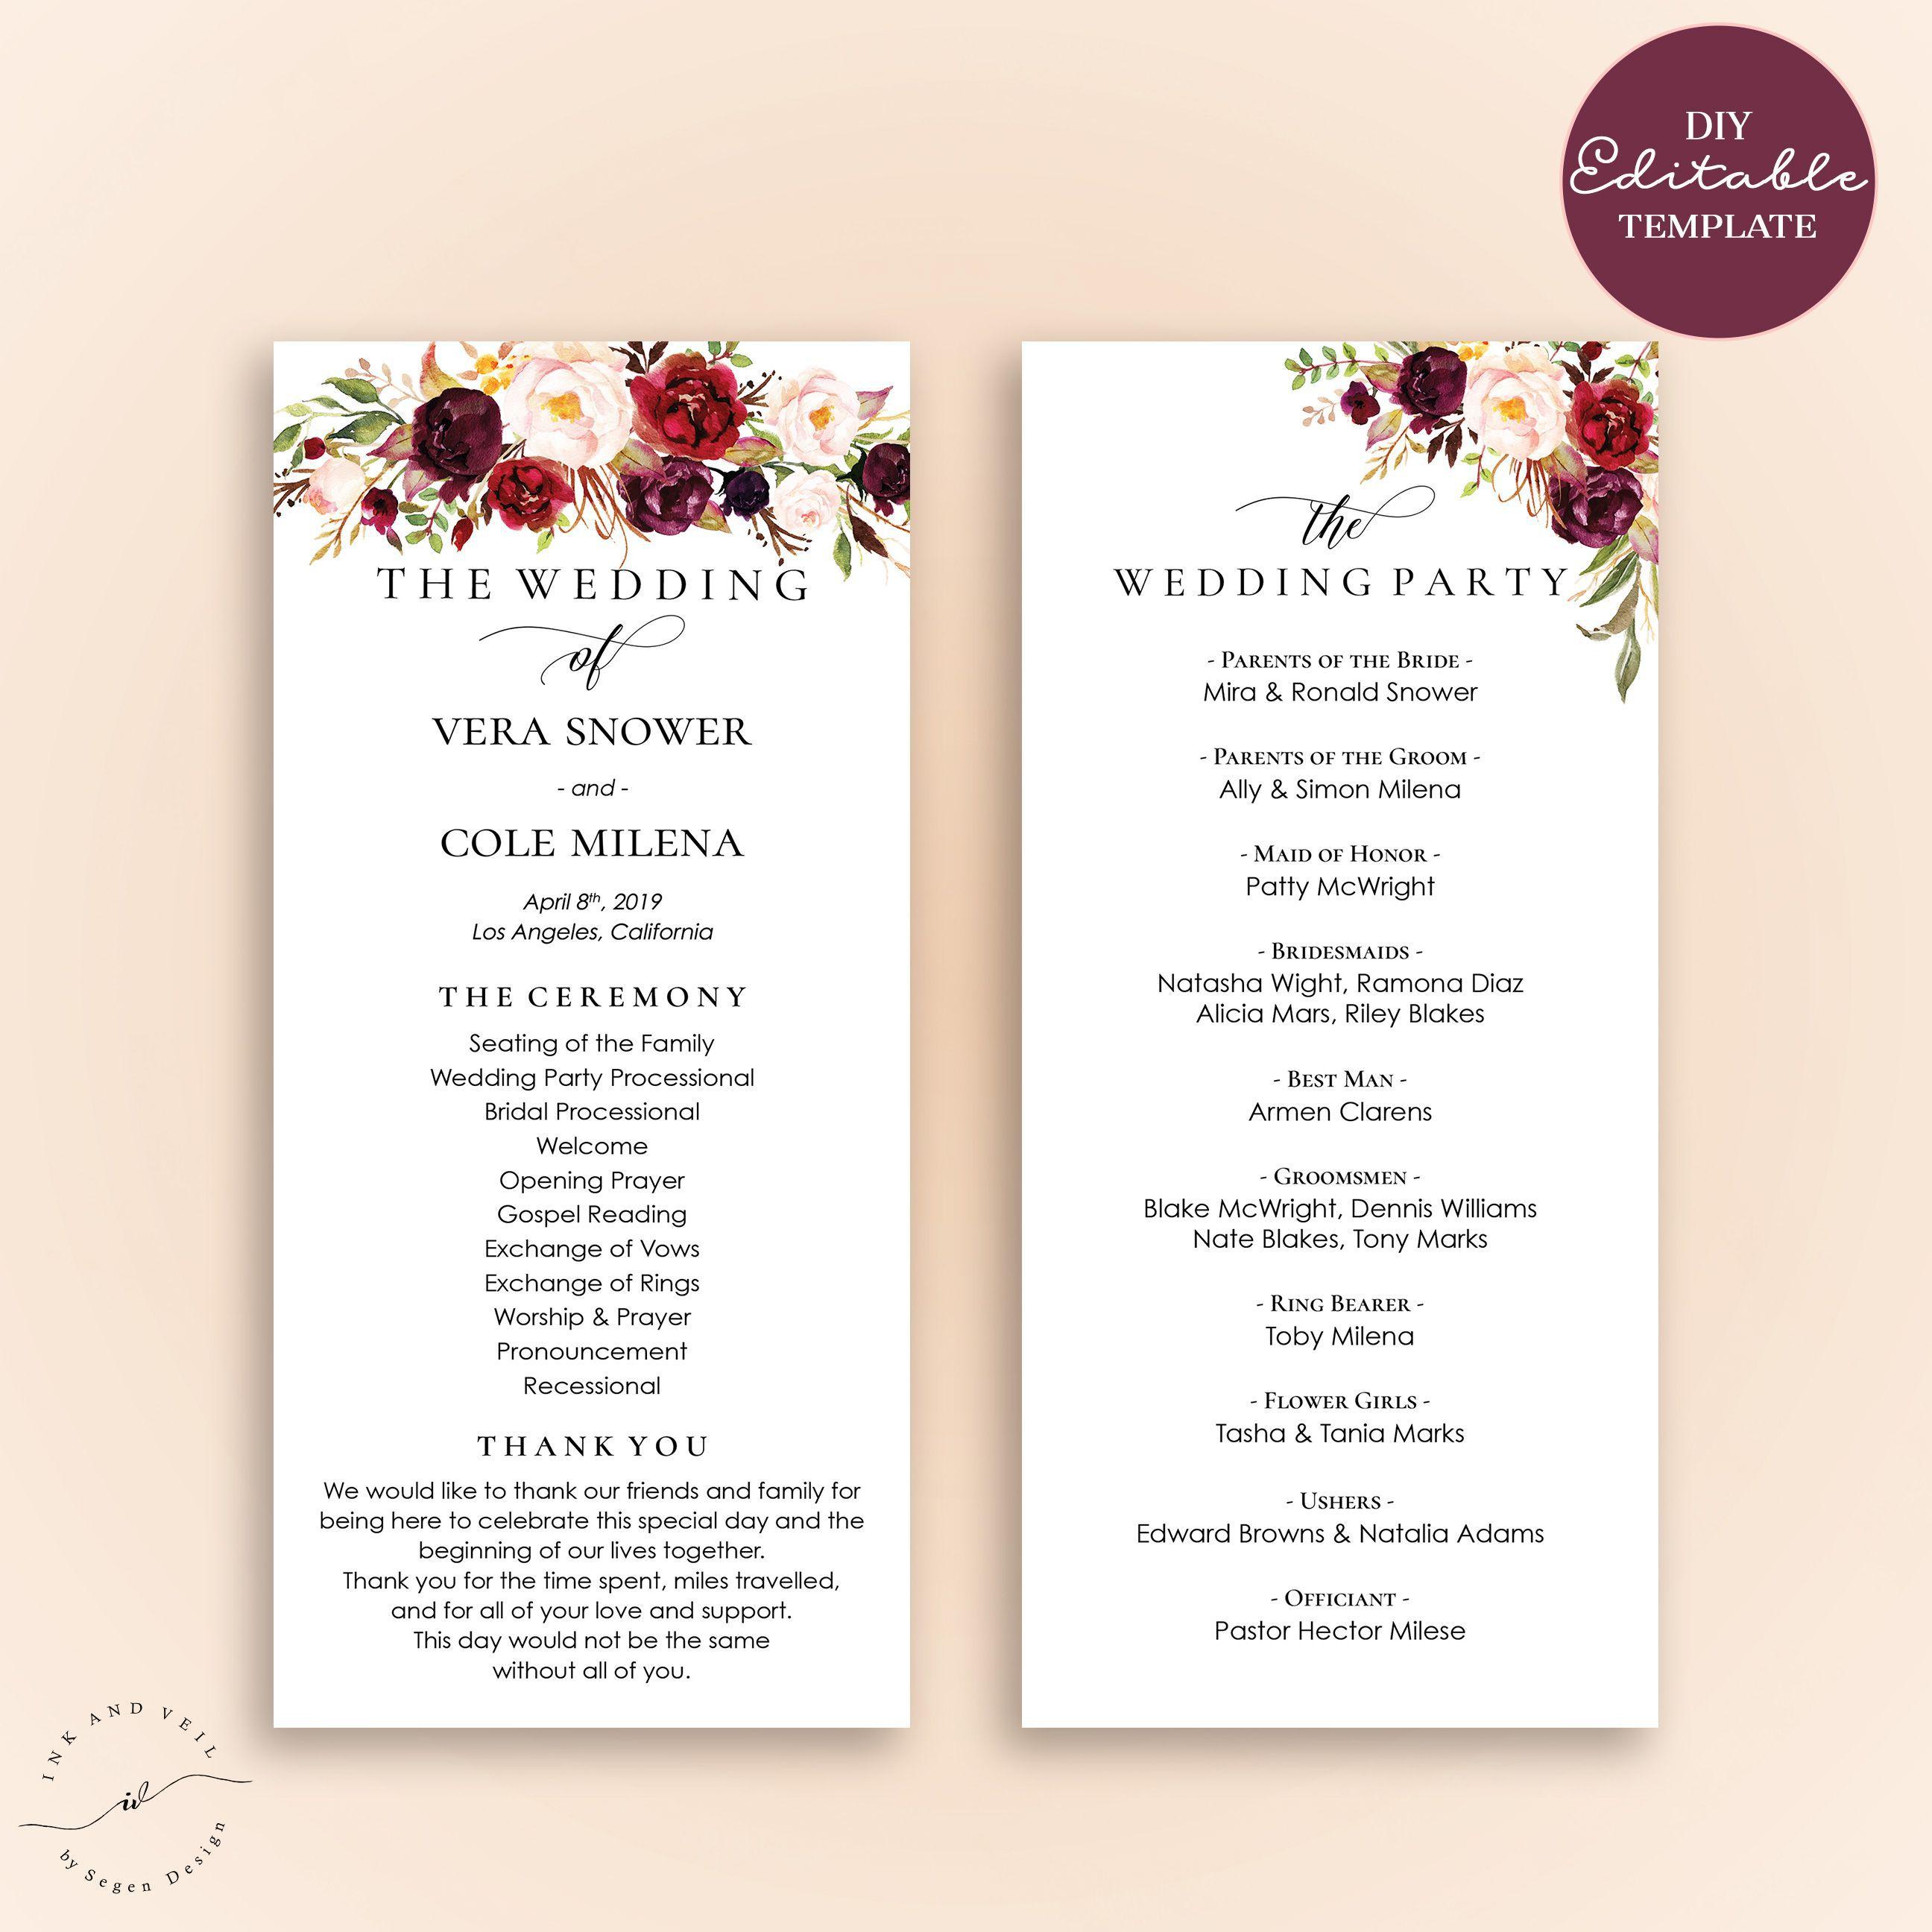 003 Stirring Free Template For Wedding Ceremony Program Design Full